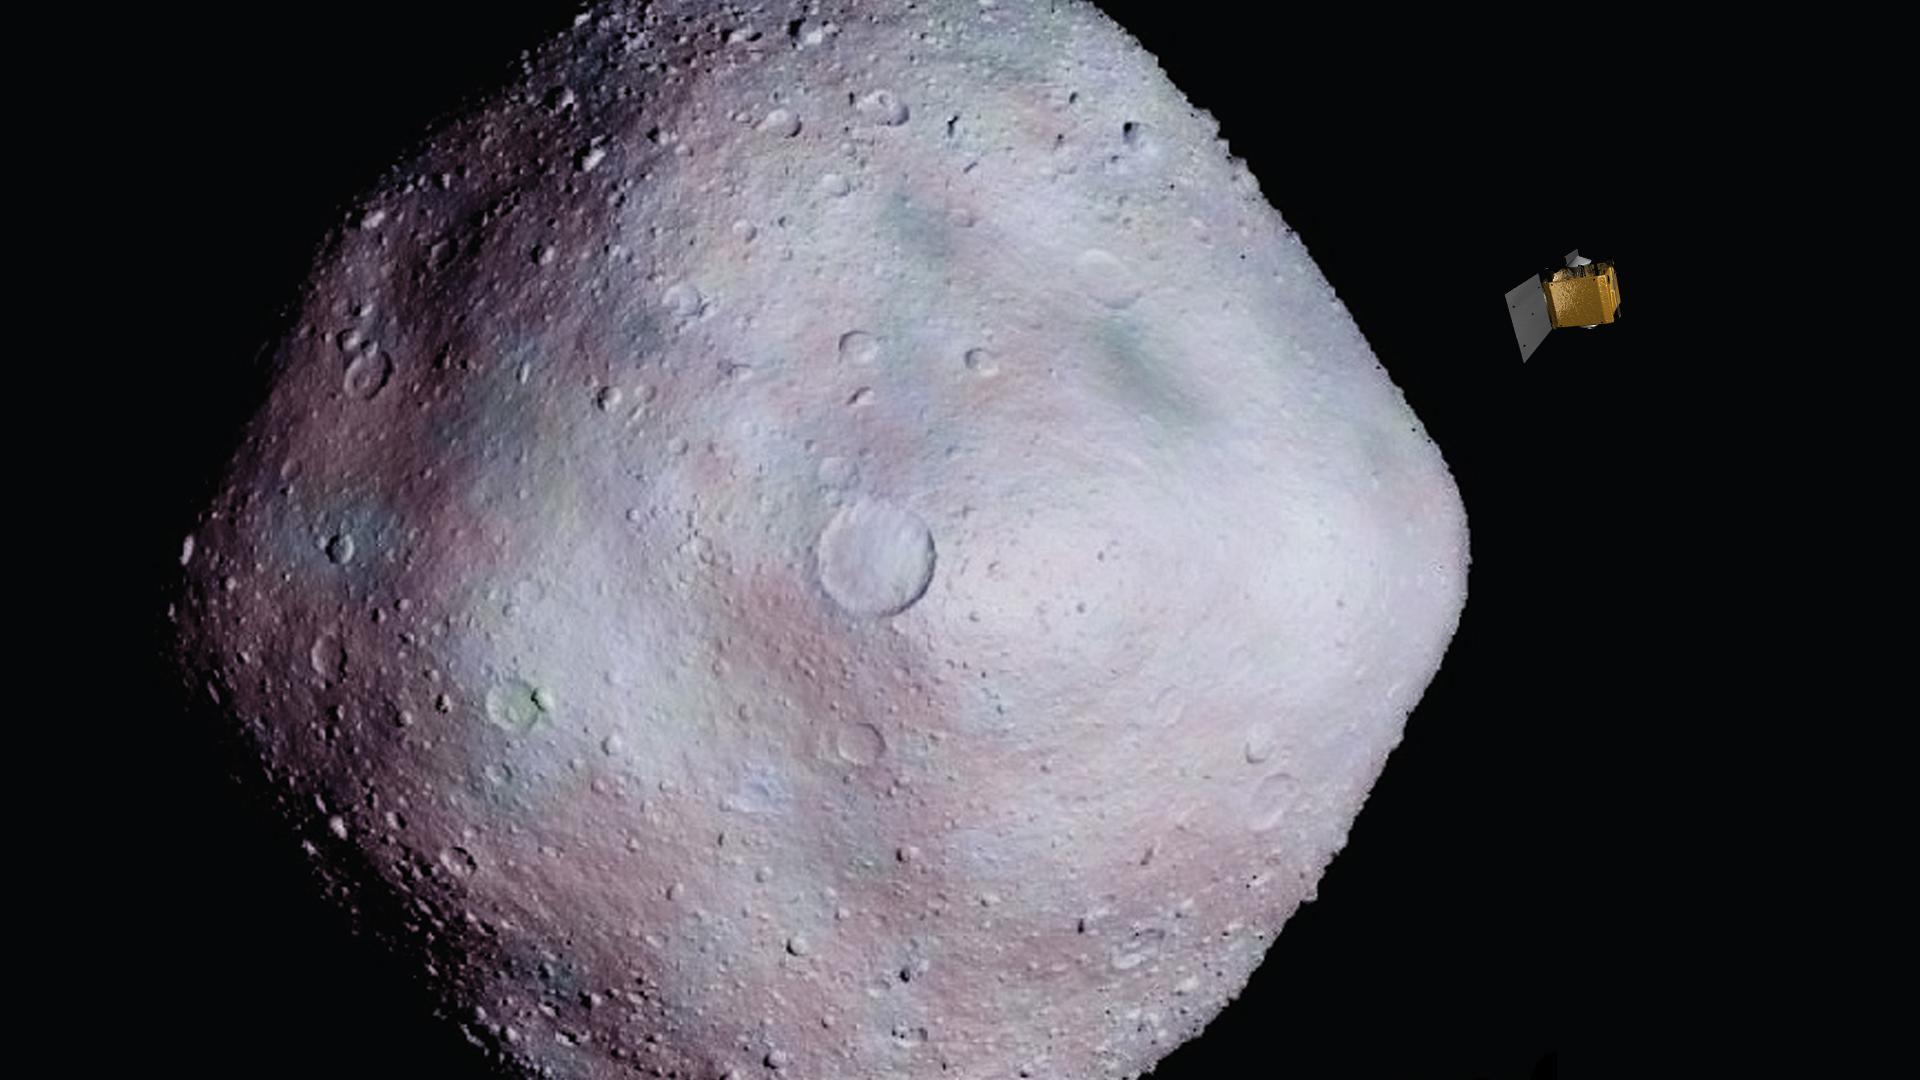 asteroid 1999 rq36 - HD1484×835